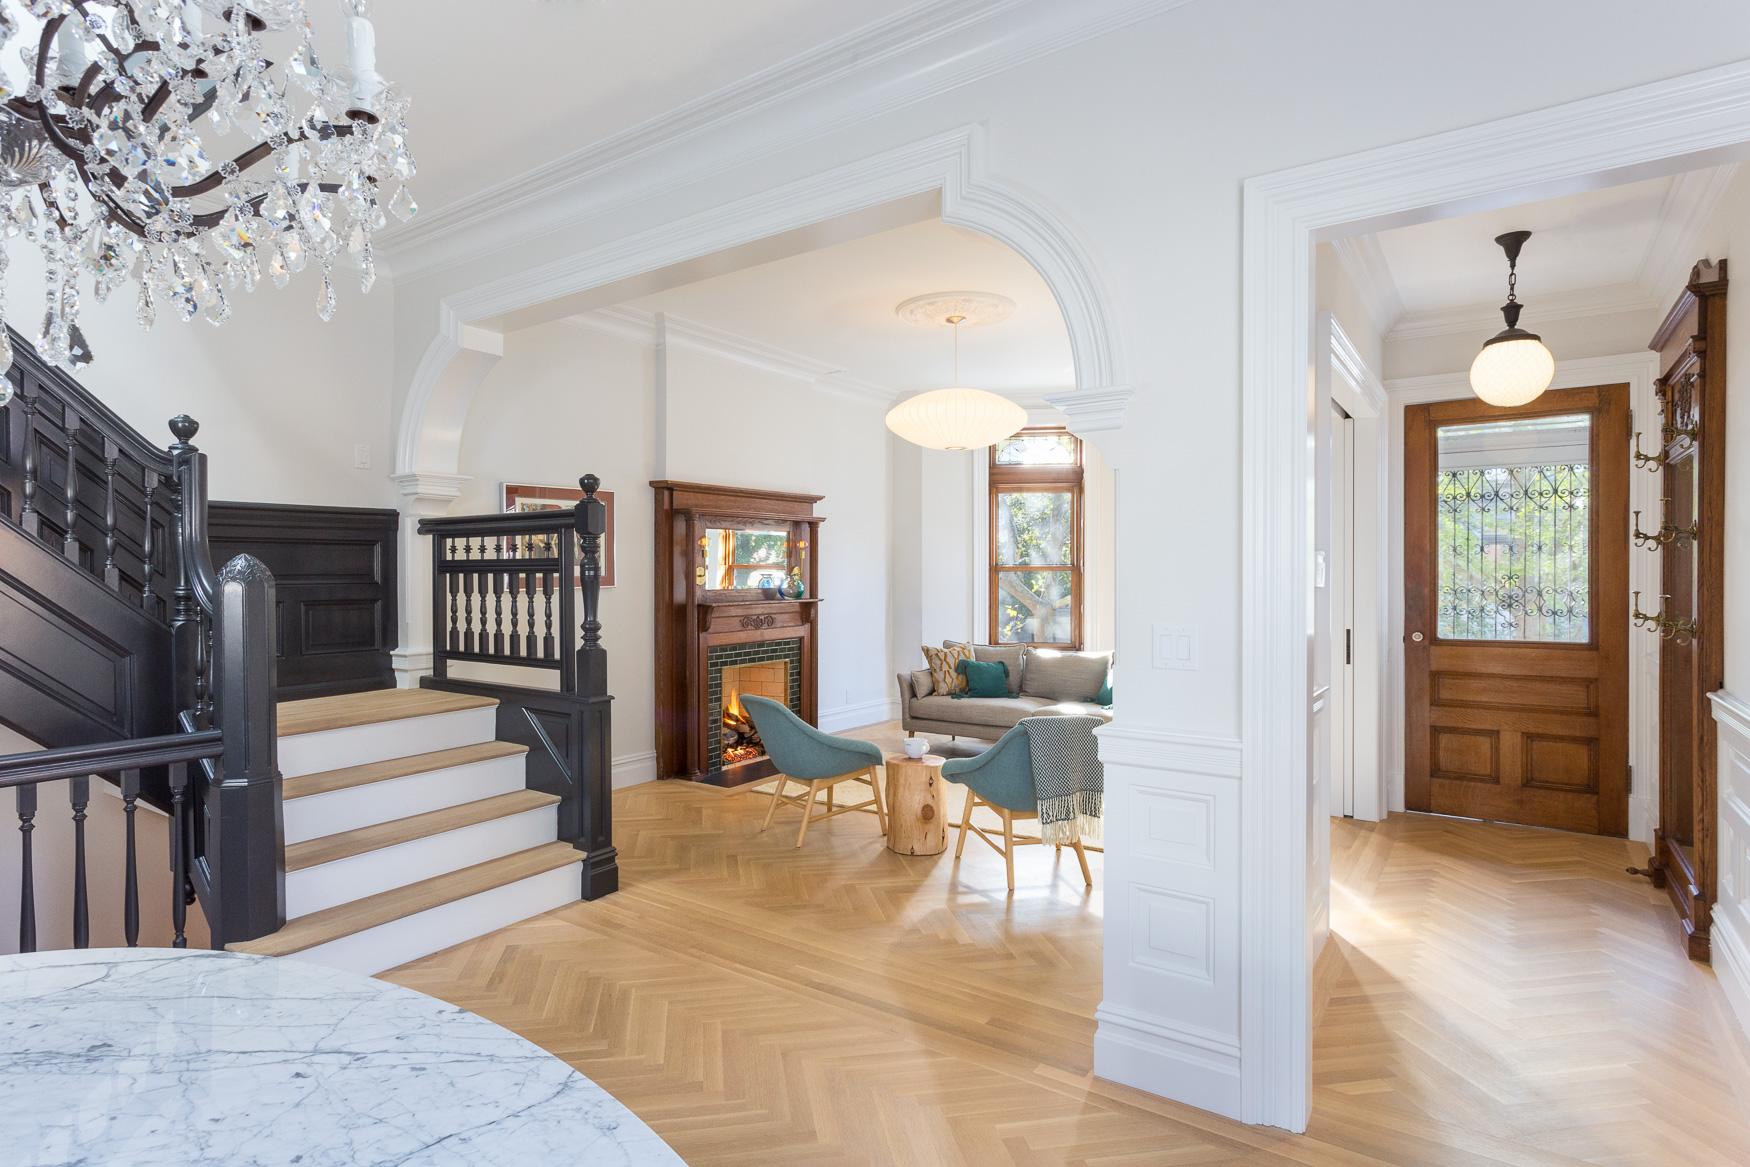 Interior Design Services | Ben Herzog Architect, PC